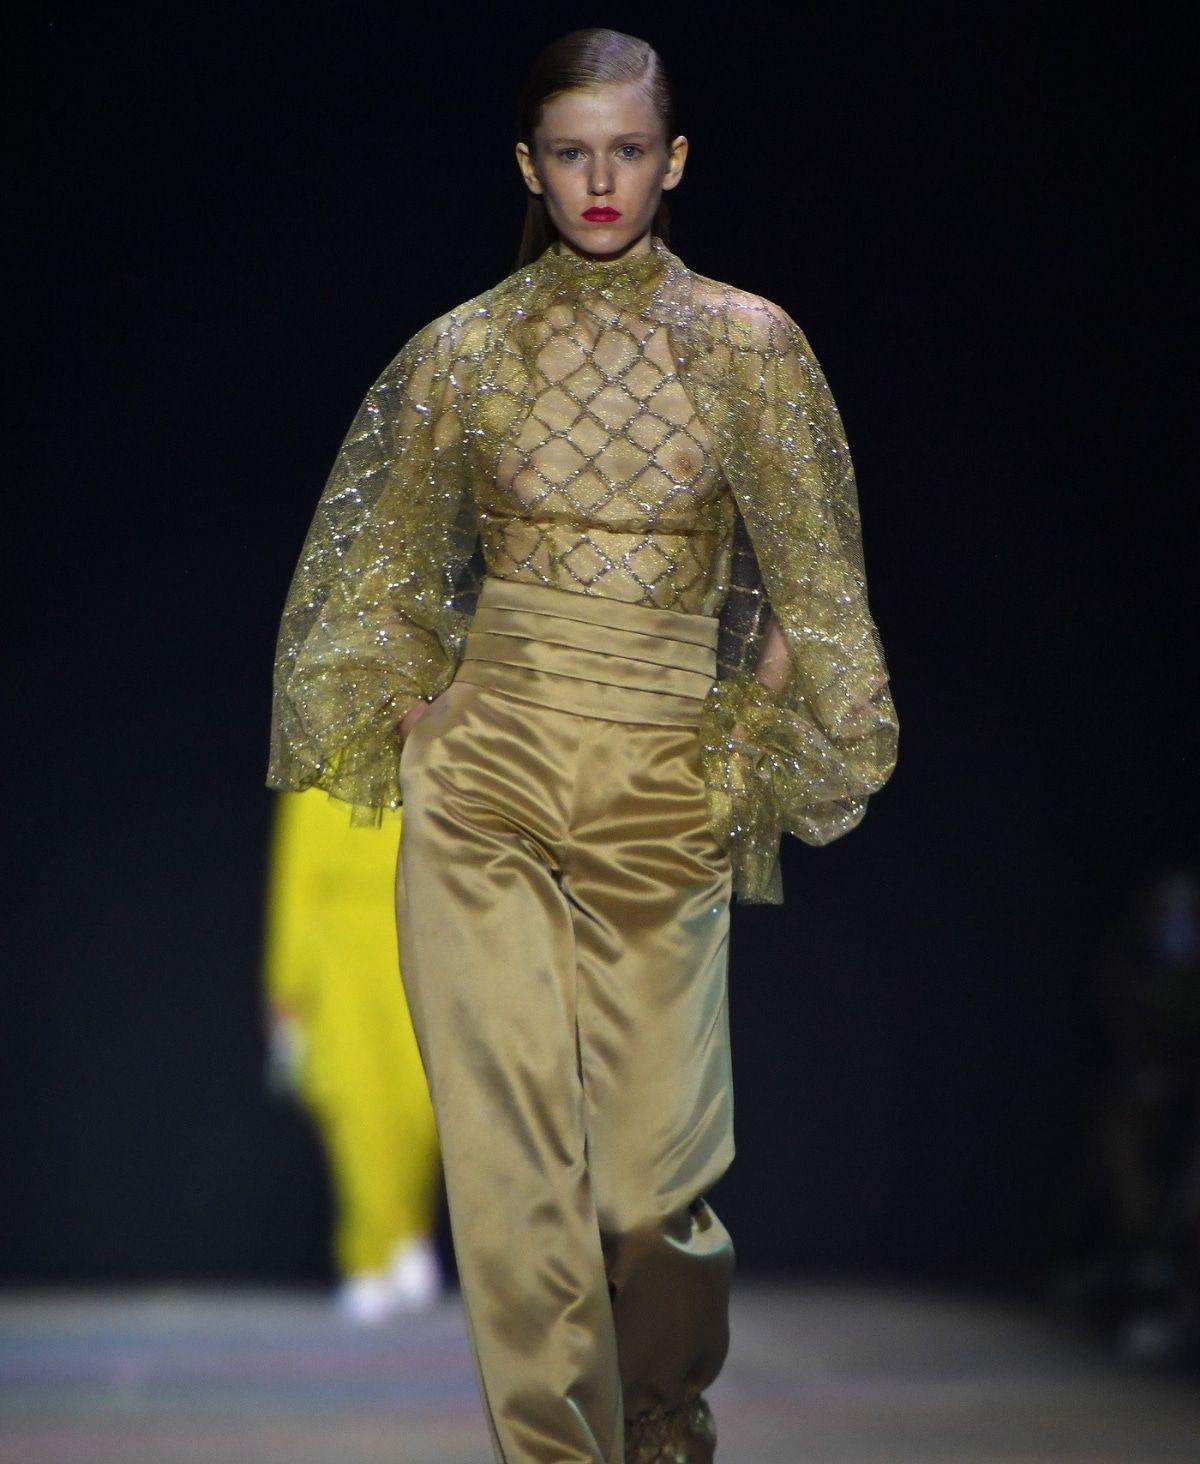 Berlin Fashion Week: Kilian Kerners Killer-Comeback